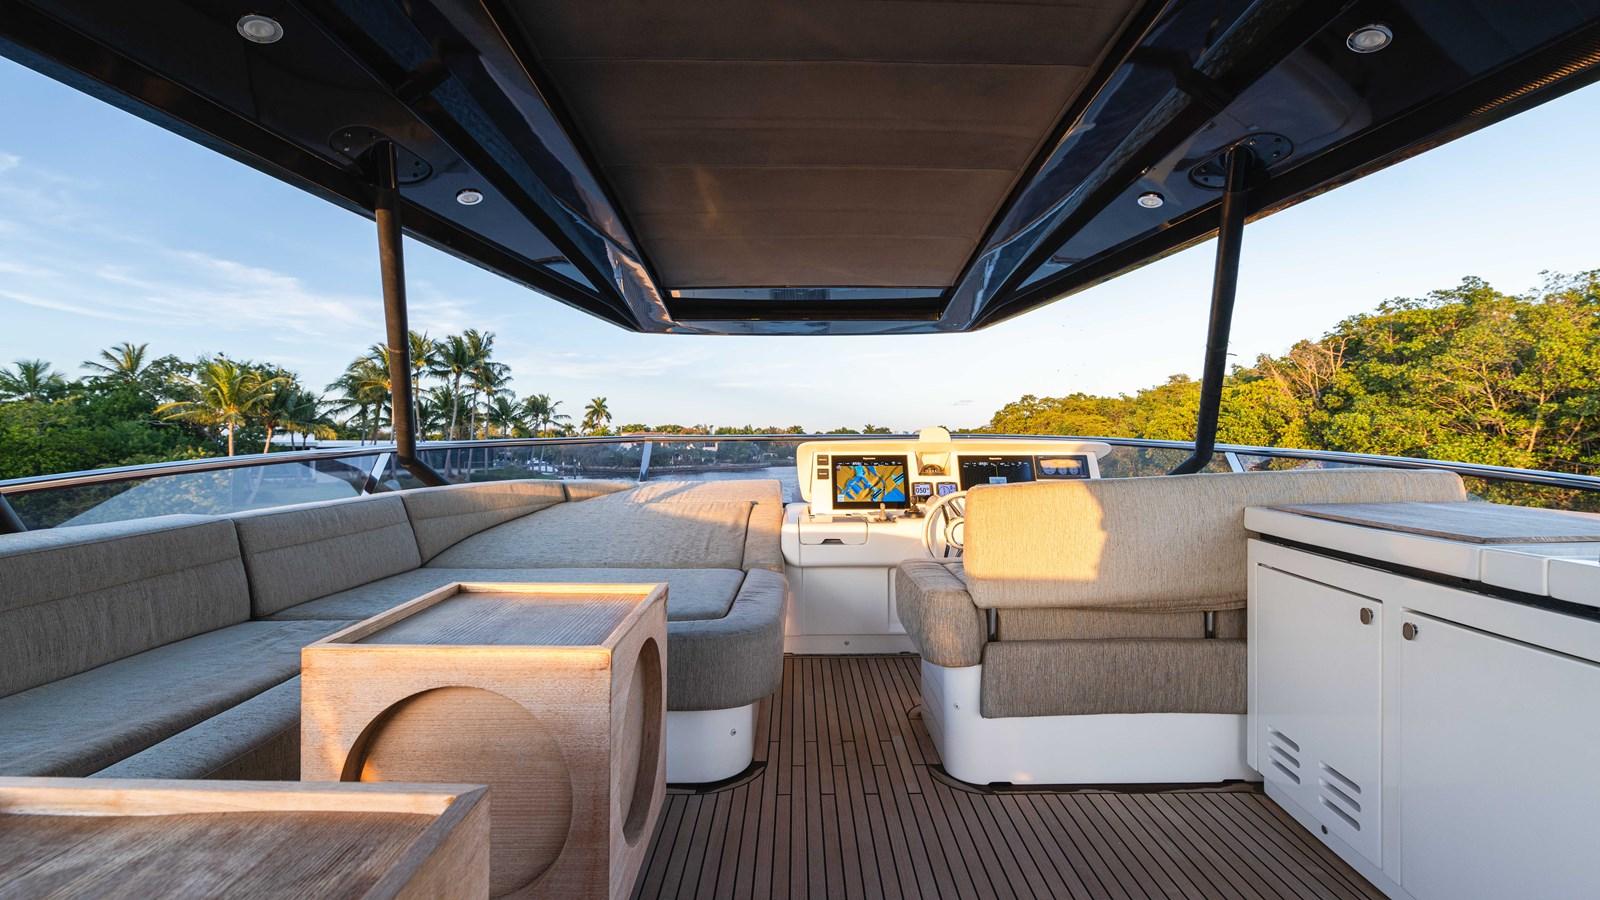 76 Monte Carlo (81 of 127) 2014 MONTE CARLO YACHTS Motoryacht Motor Yacht 2825106